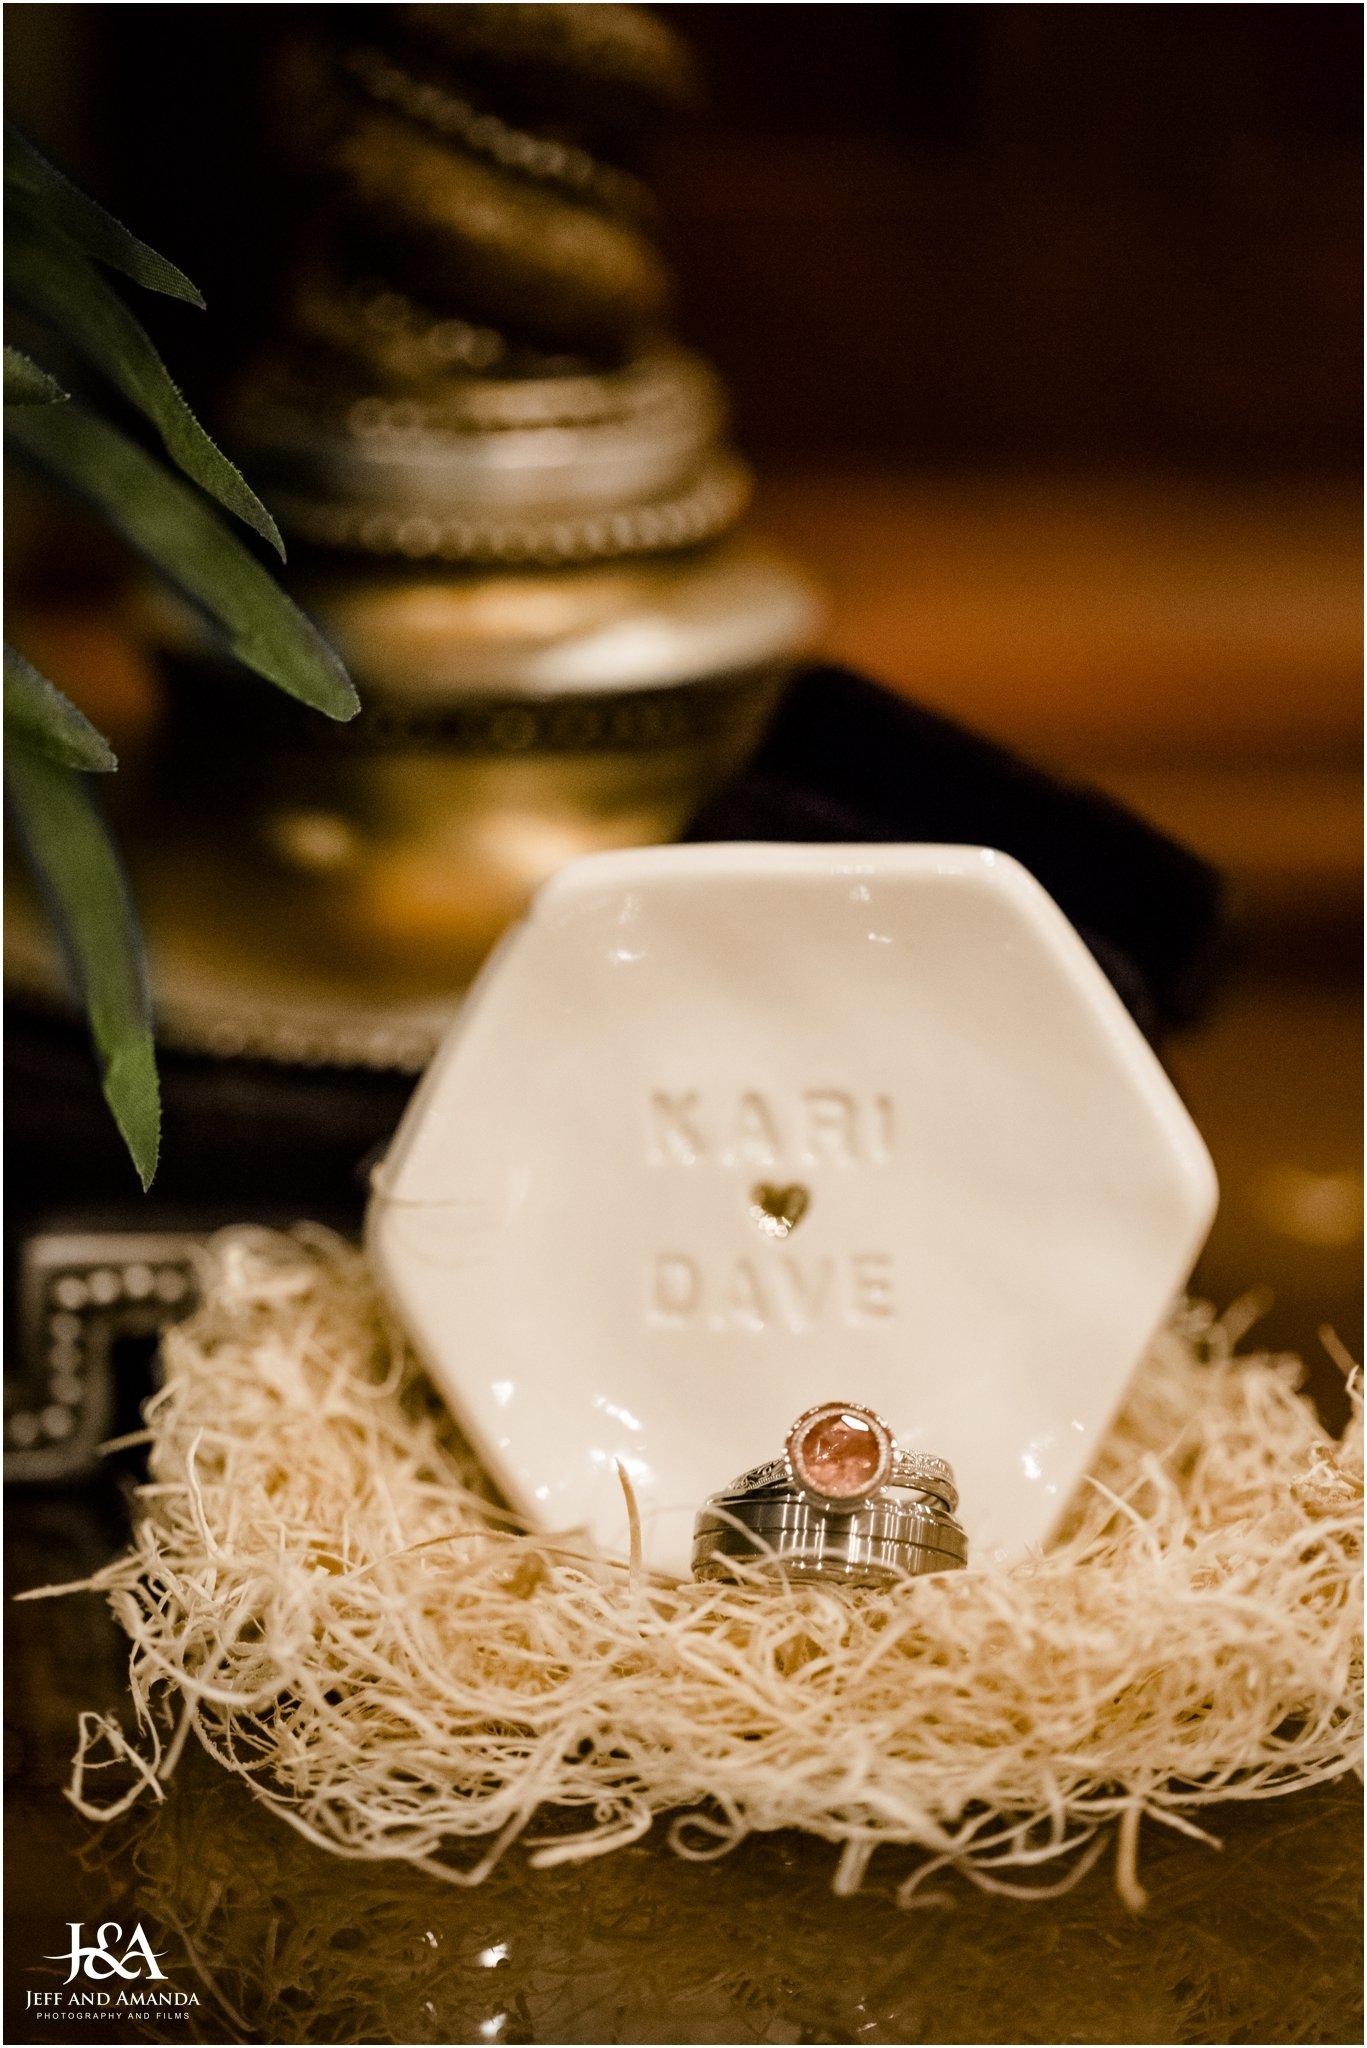 Dave and Kari s Wedding-Facebook Ready-0014.jpg